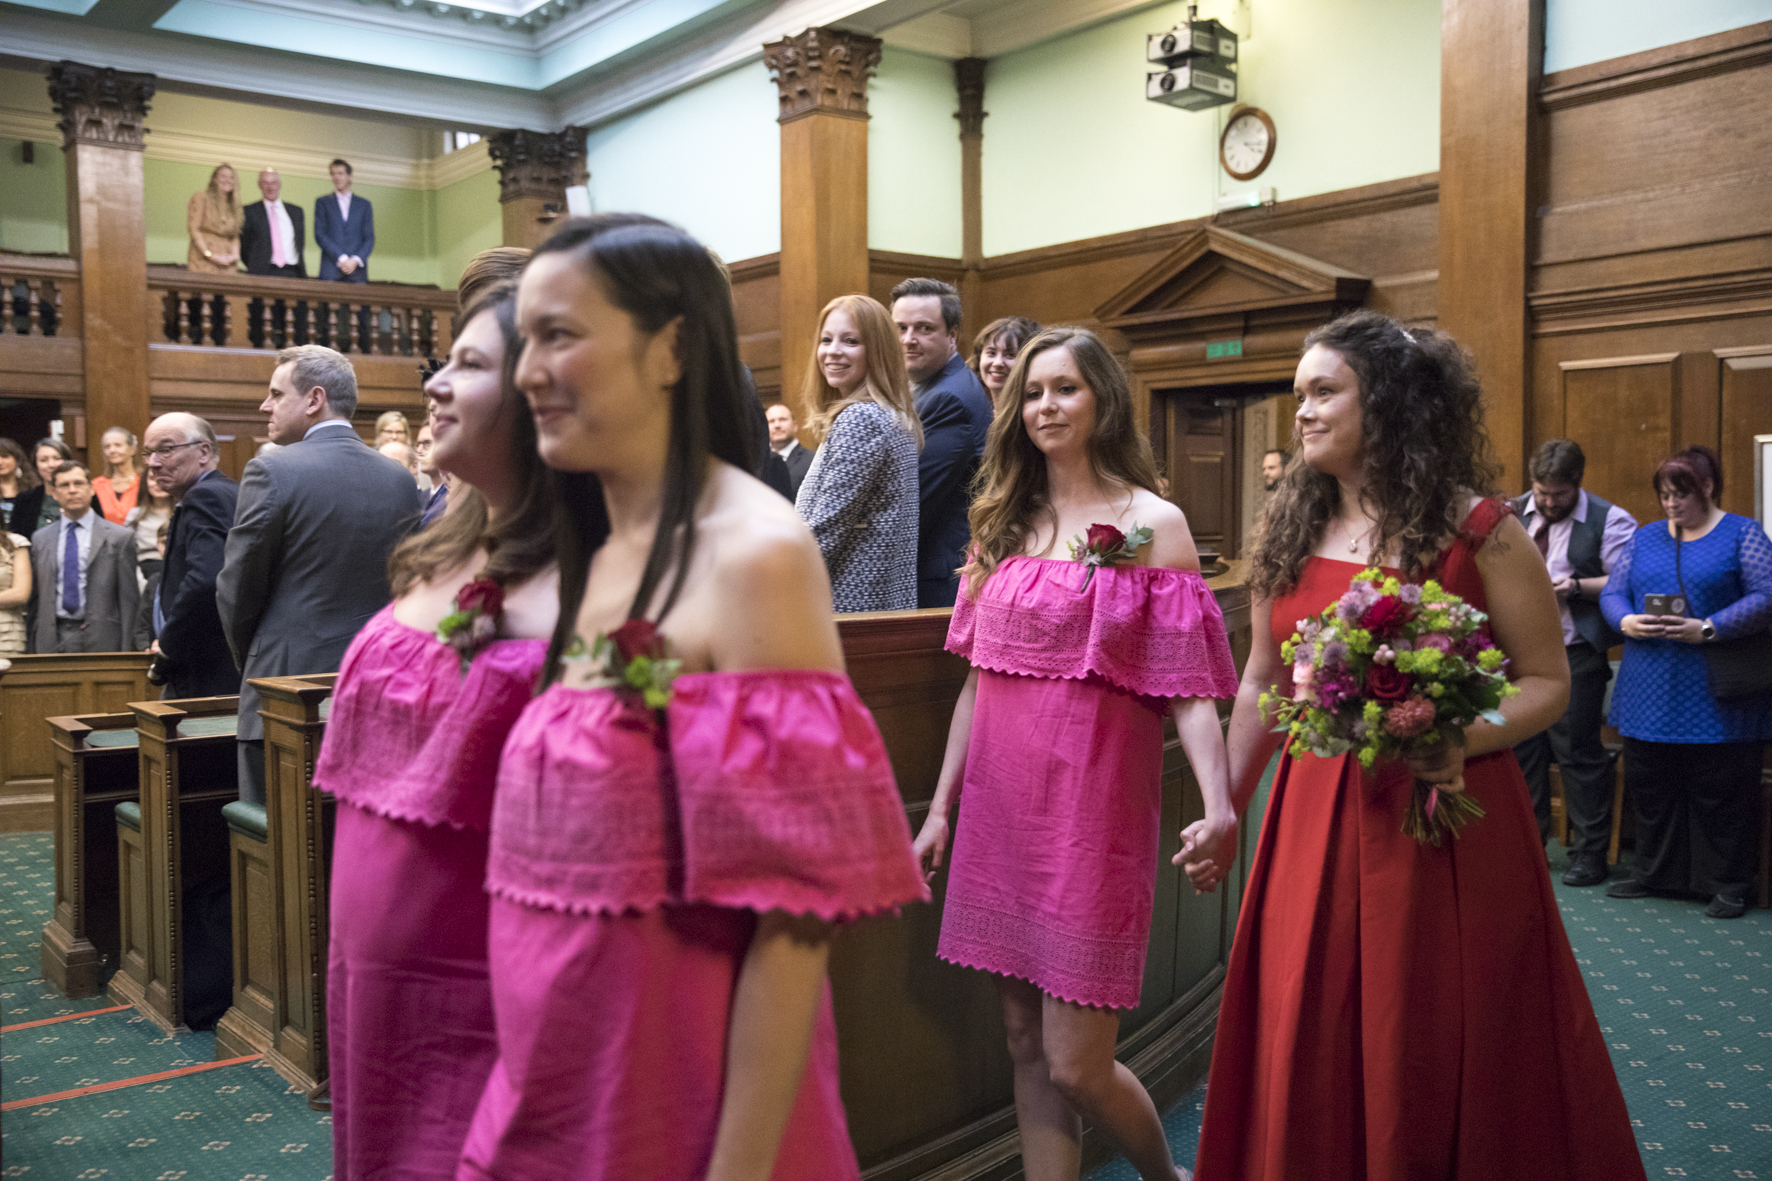 Wedding example_J&J_'16__69A1646_Claudia Leisinger.jpg